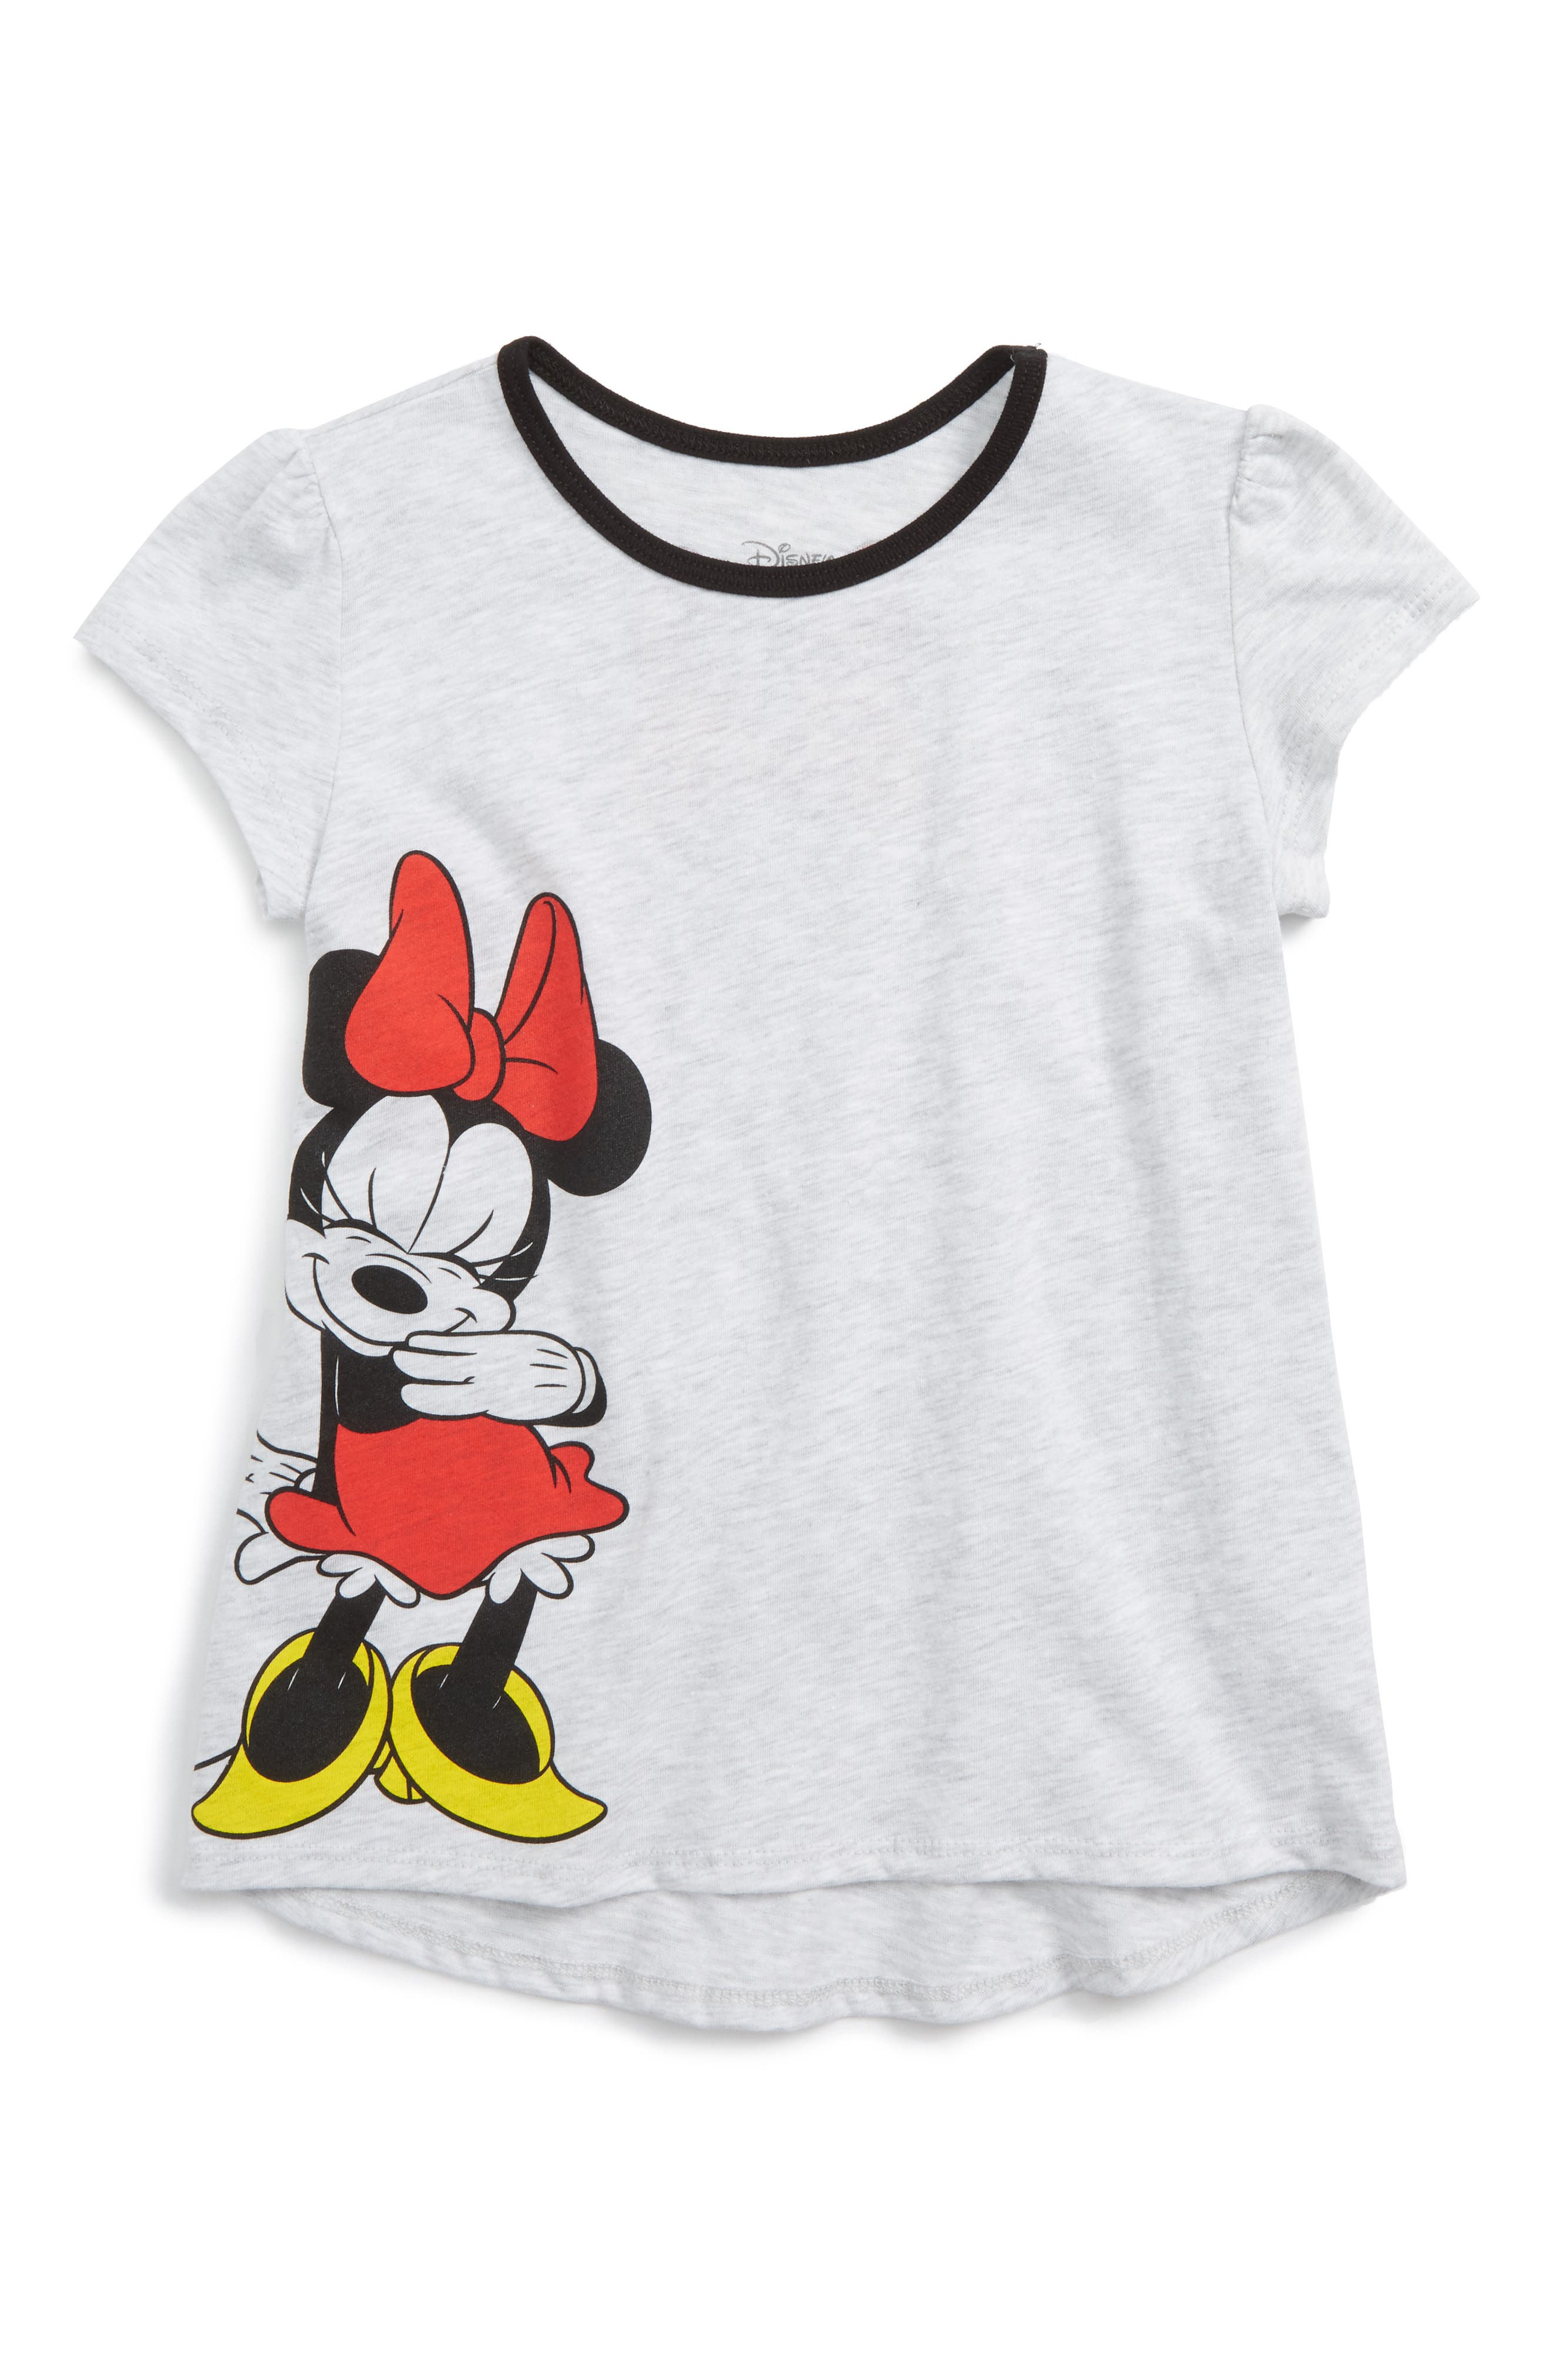 Disney - Minnie Mouse Graphic Tee,                         Main,                         color, Ash Heather / Black